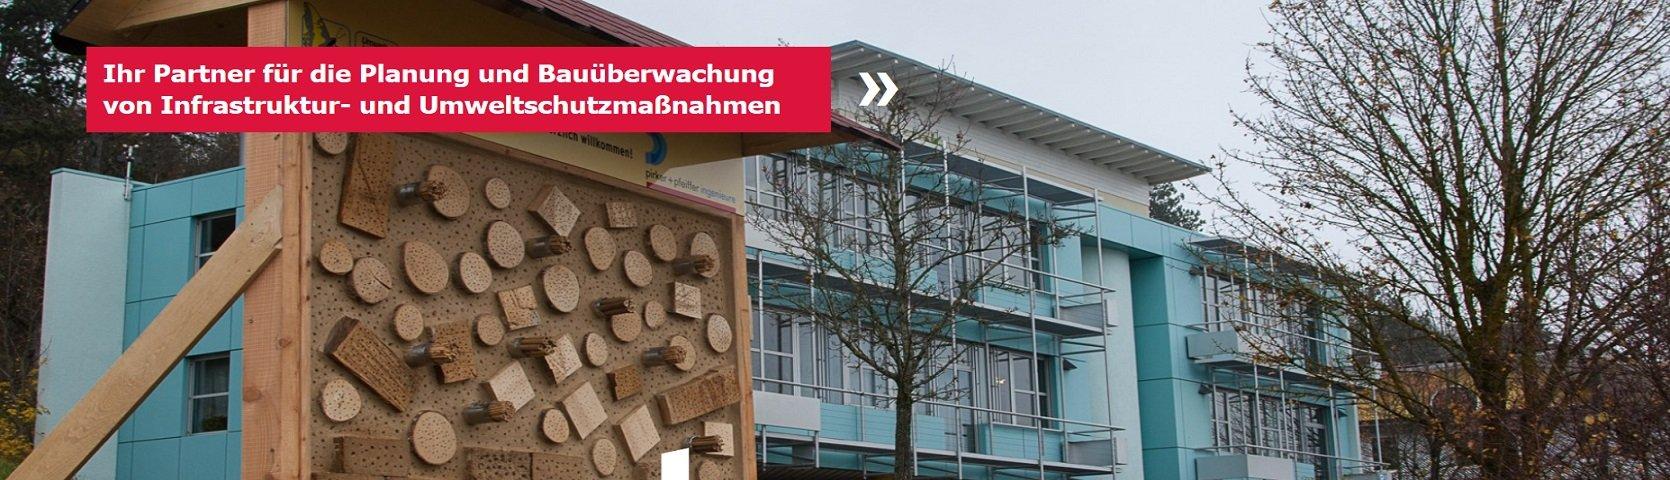 pirker + pfeiffer ingenieure GmbH & Co. KG